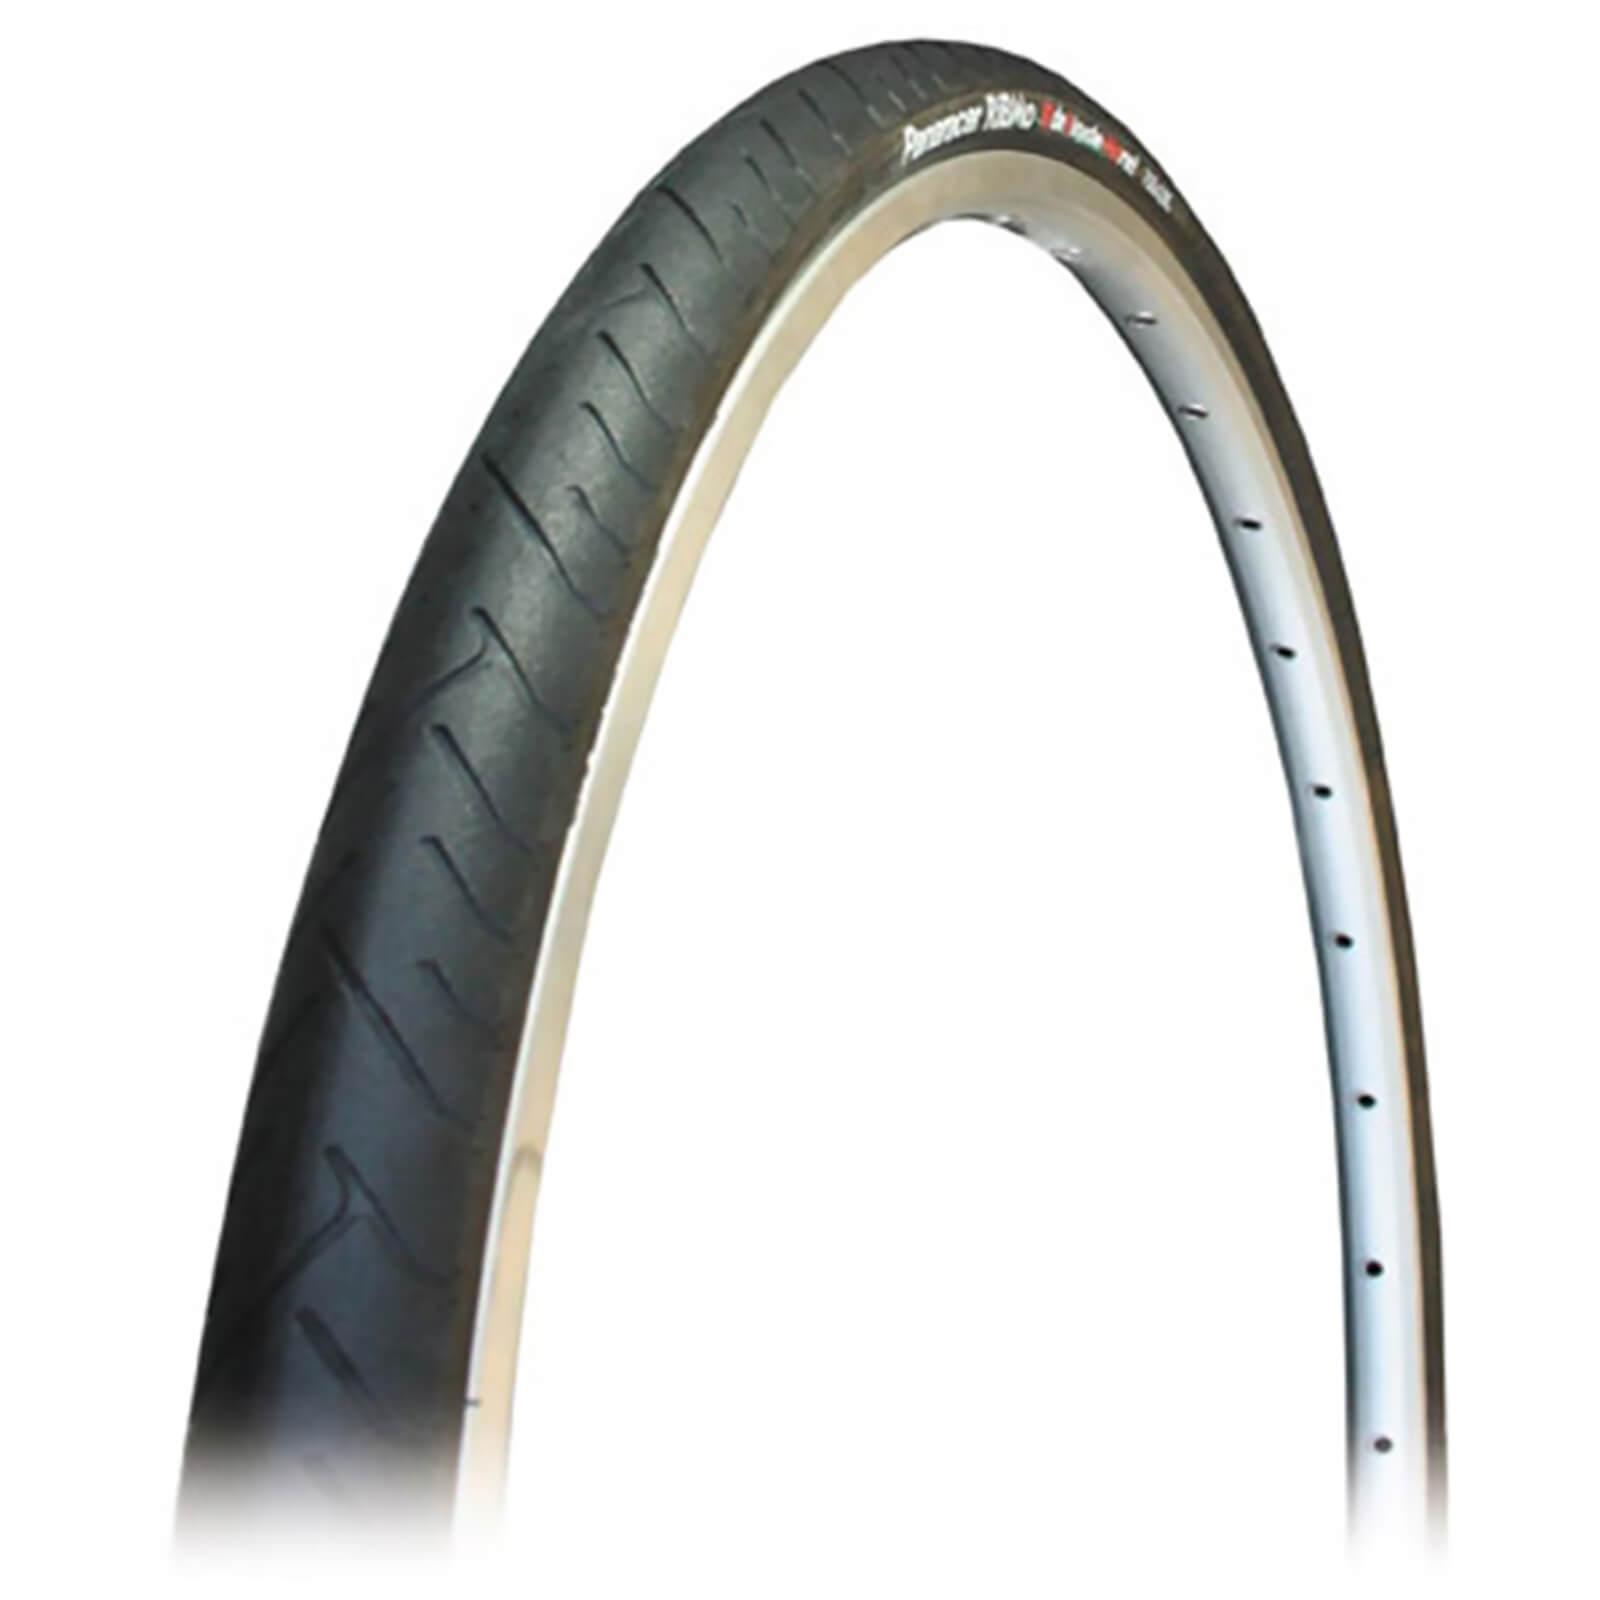 Panaracer Ribmo Clincher Road Tyre - 700C x 32mm - Black